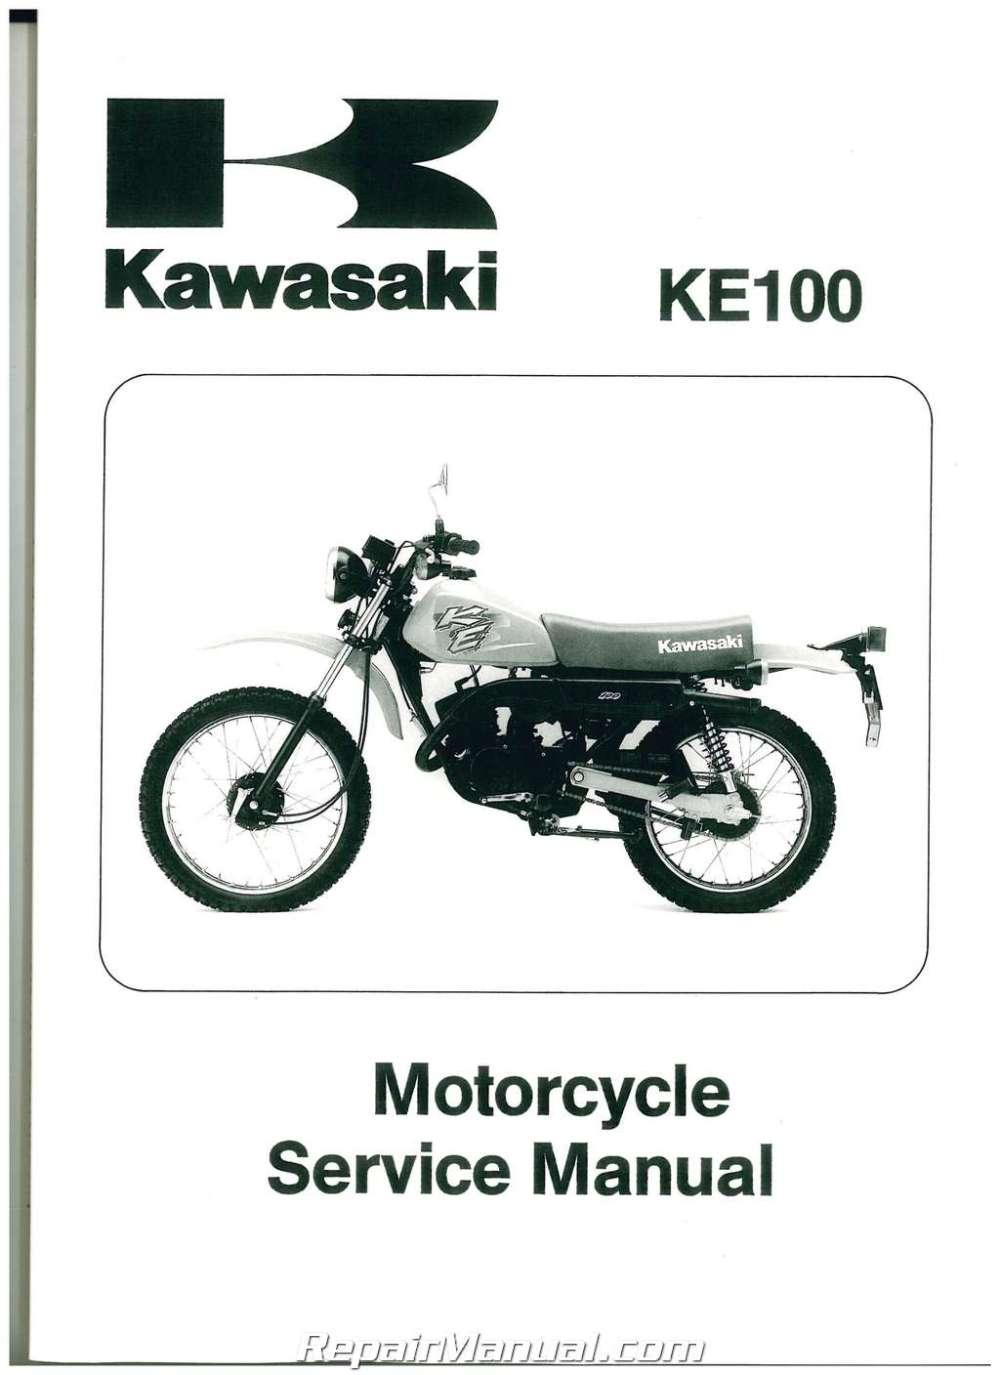 medium resolution of 1979 2001 kawasaki ke100 two stroke motorcycle service manual wiring diagram 2001 kawasaki ke 100